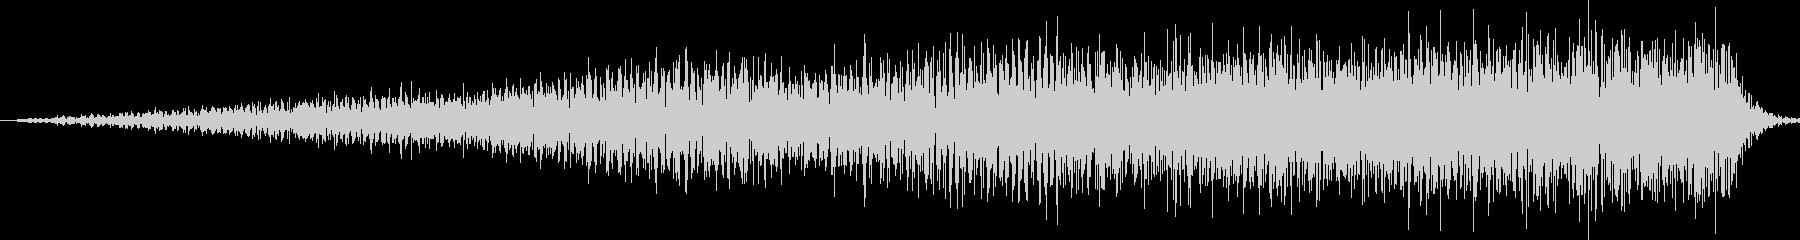 SE 高音ノイズ ギューンDWONの未再生の波形